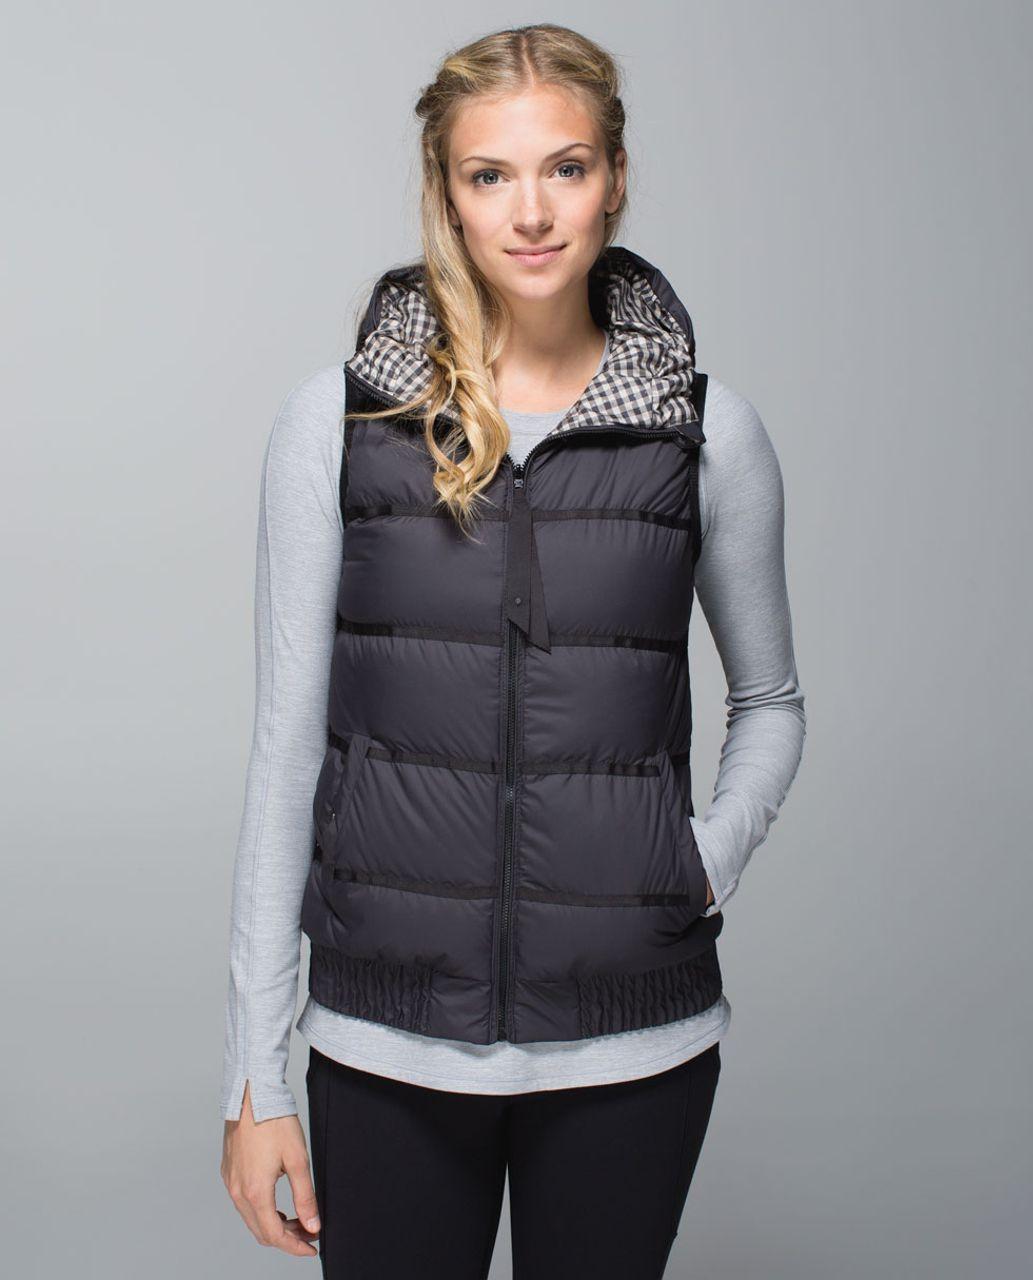 Puffy Vest lululemon chilly chill puffy vest JPICPQI